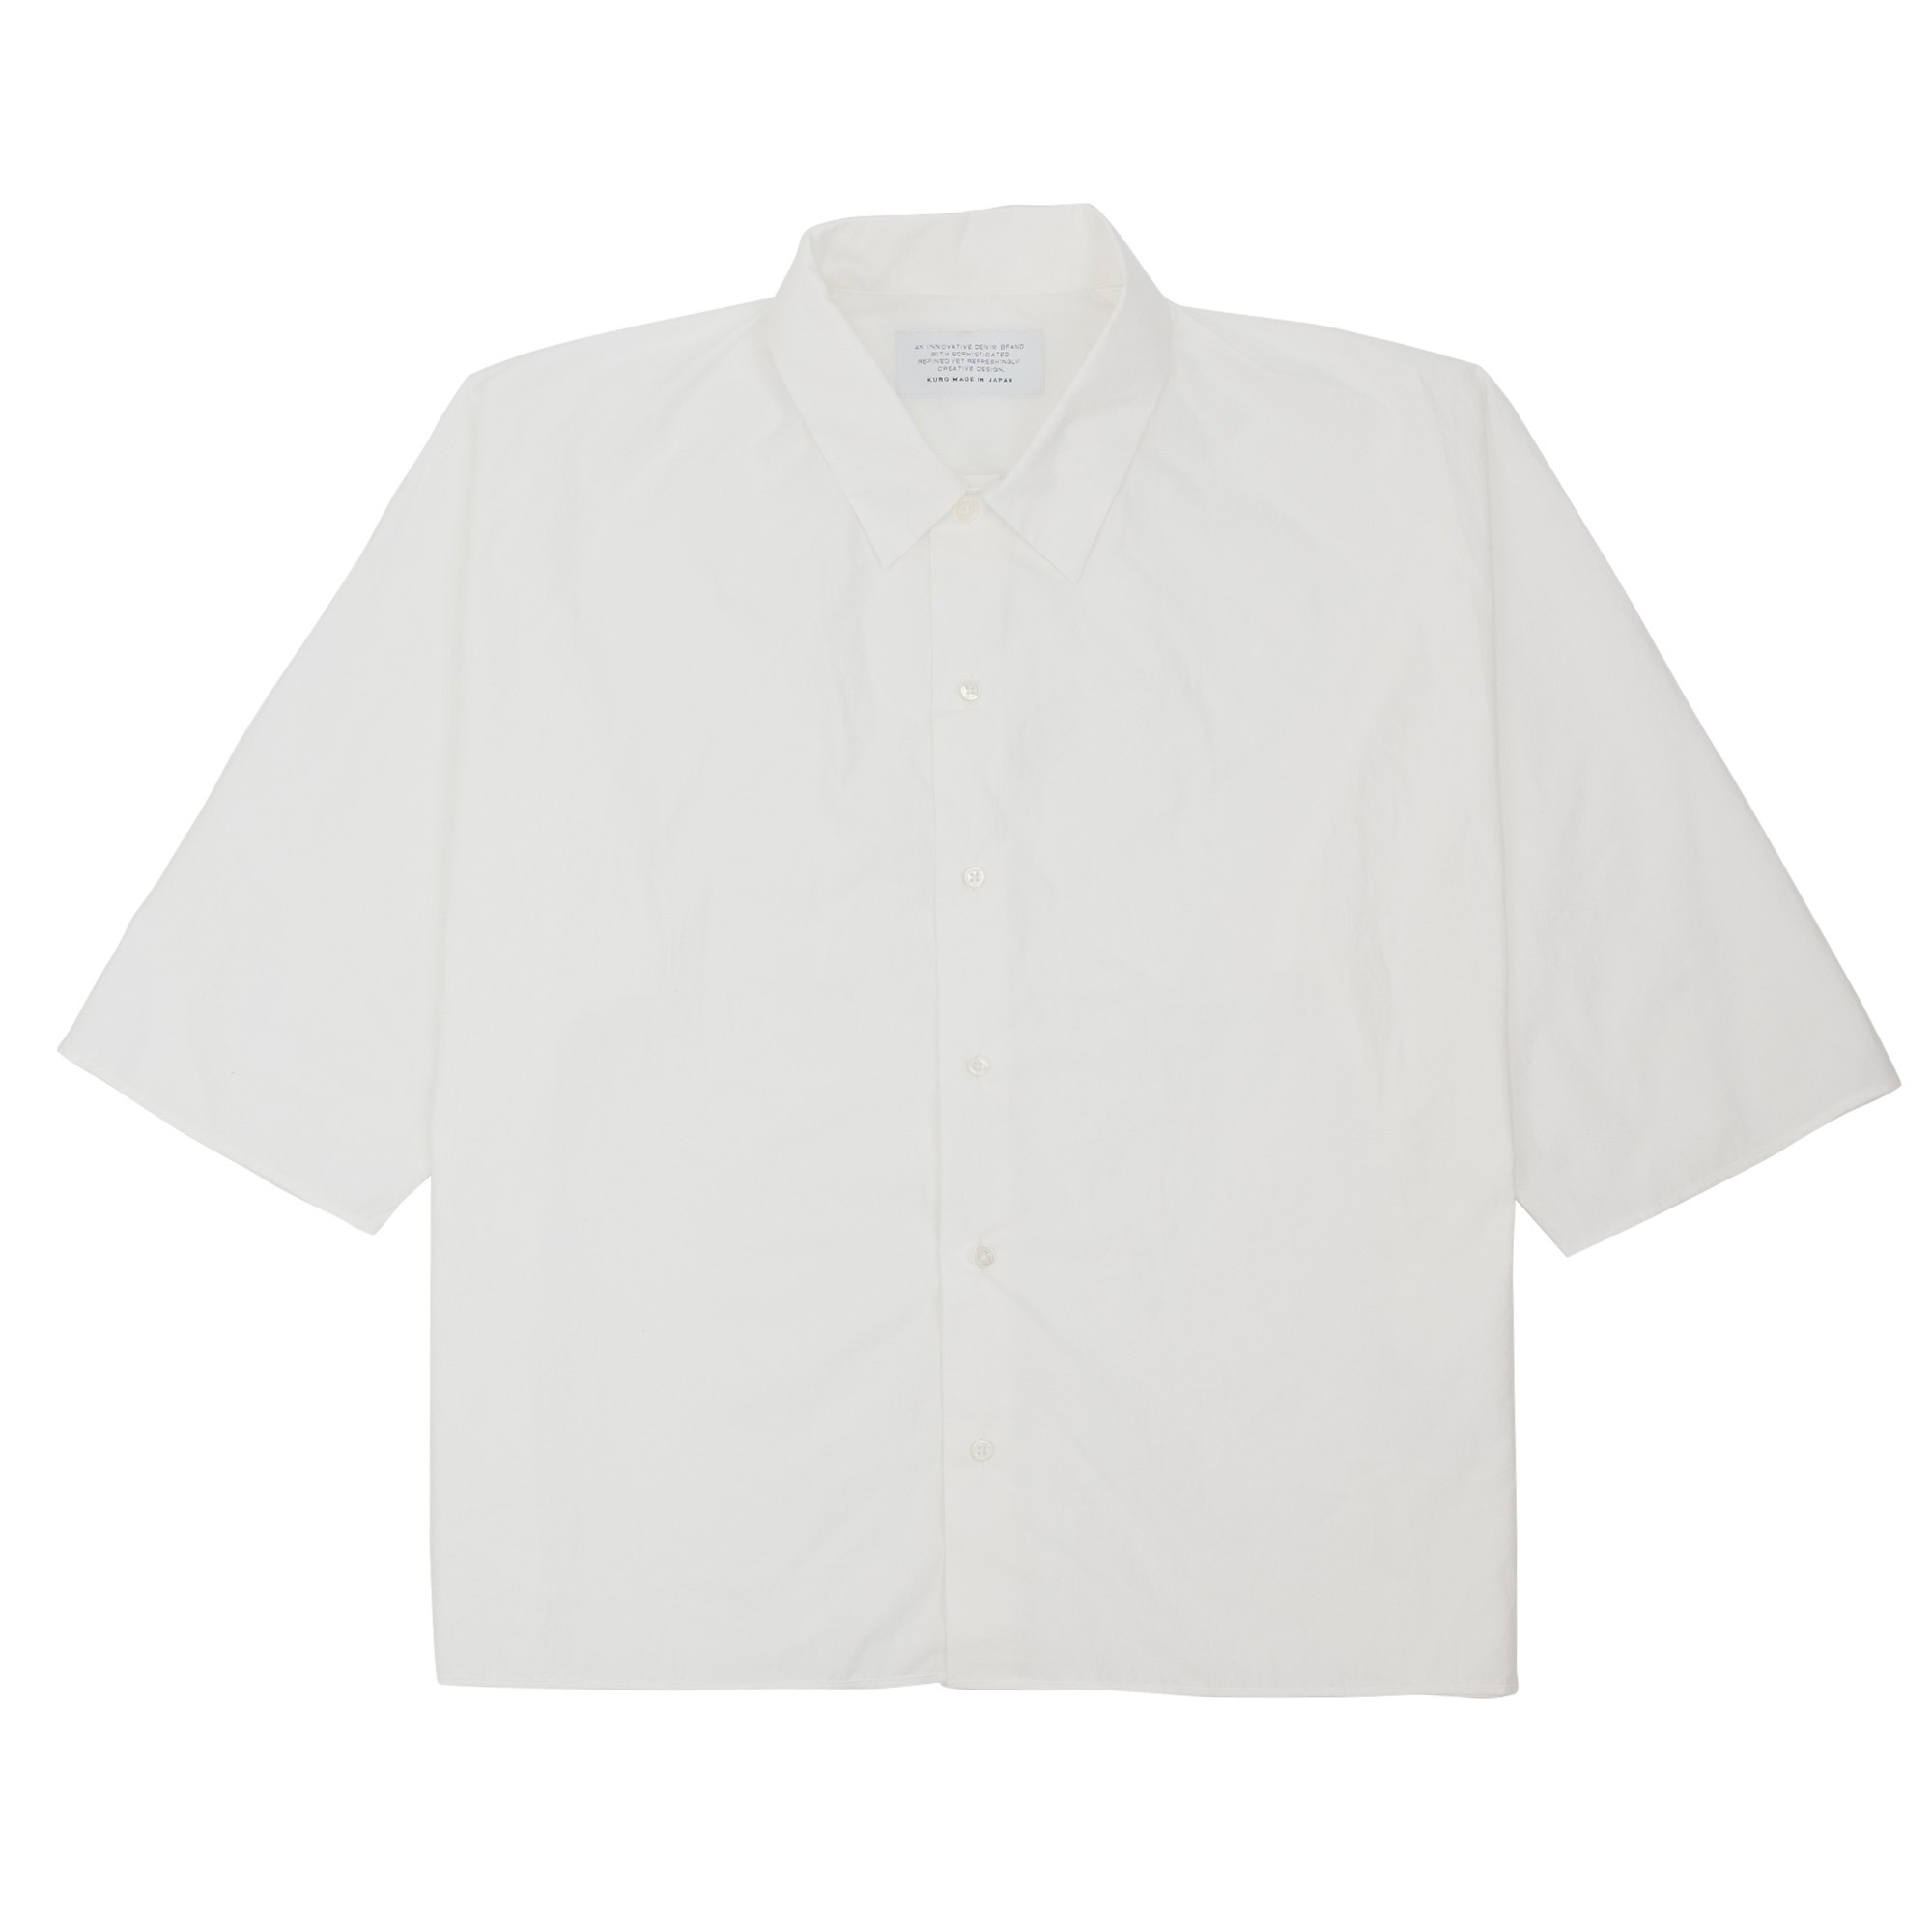 Kuro Dolman Sleeve S/S Shirt - Off White